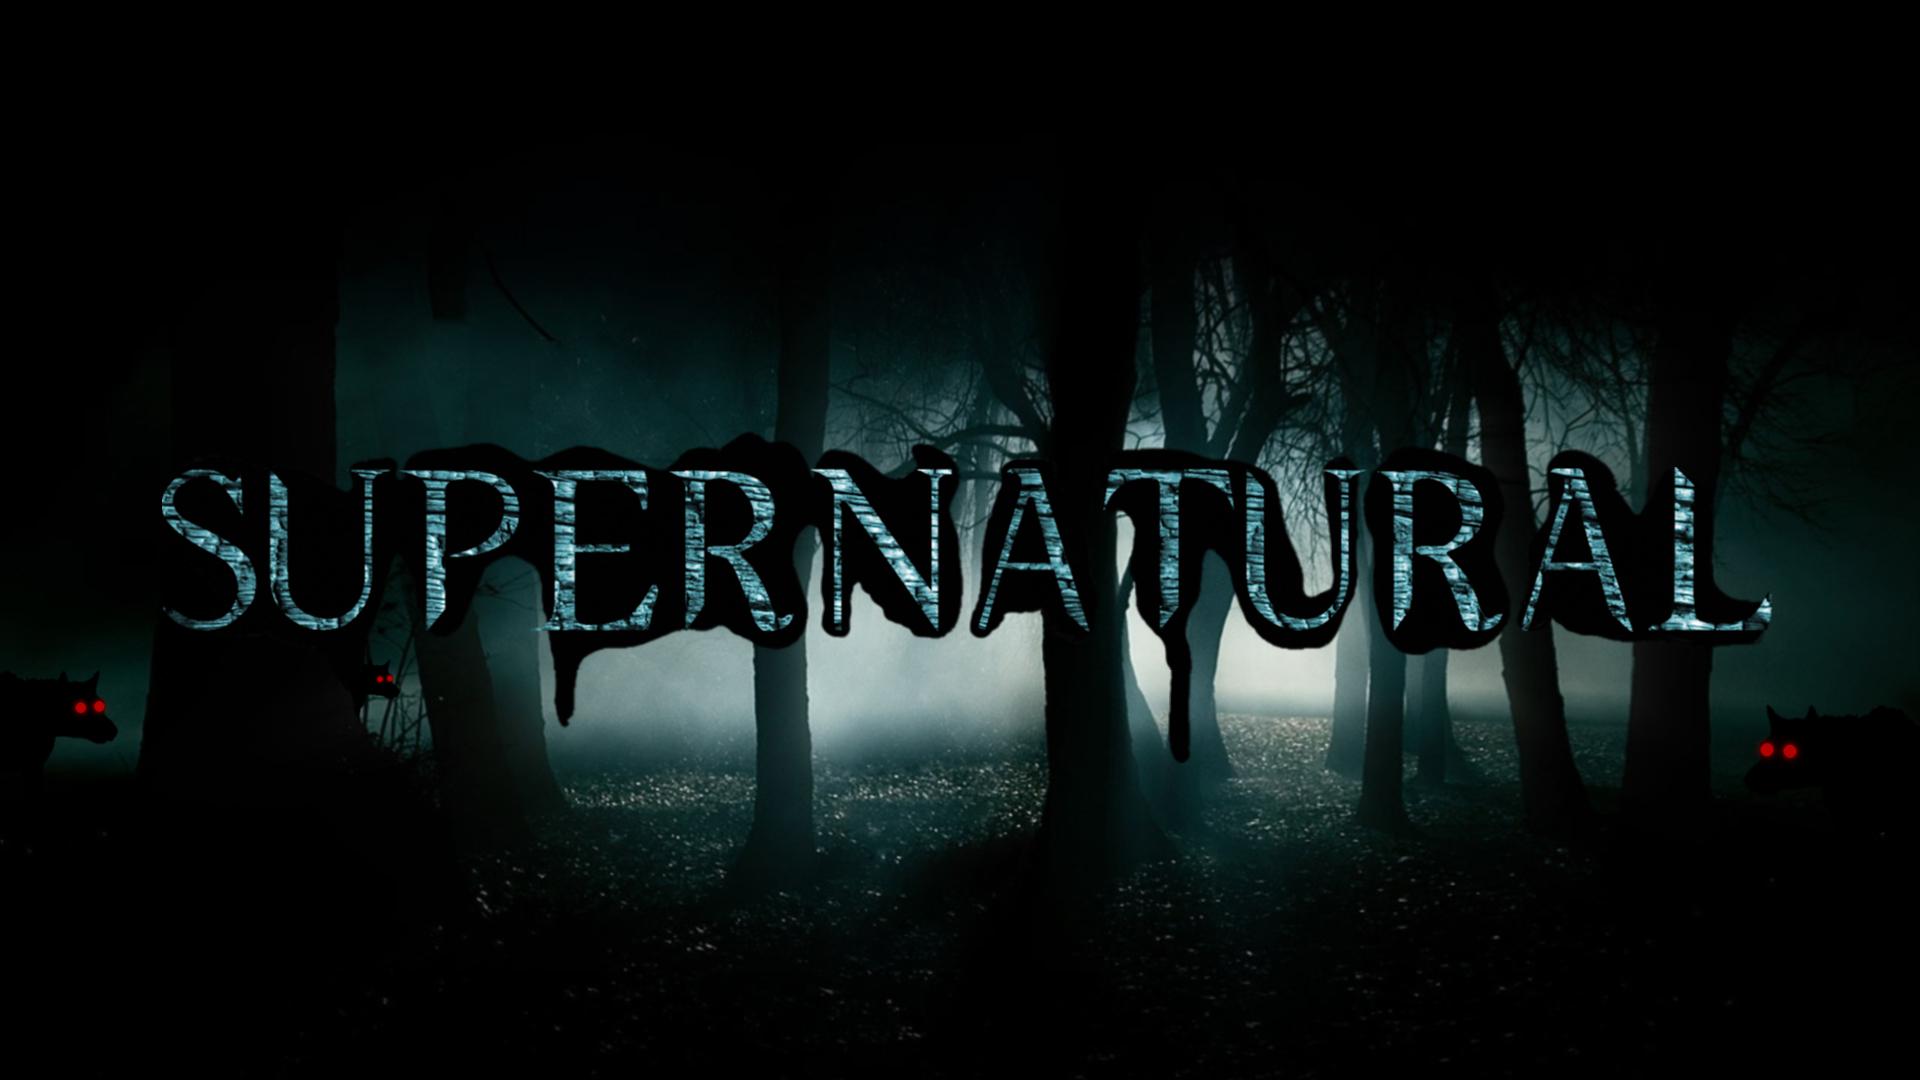 Dark Forest Of The Series Supernatural Desktop Wallpapers